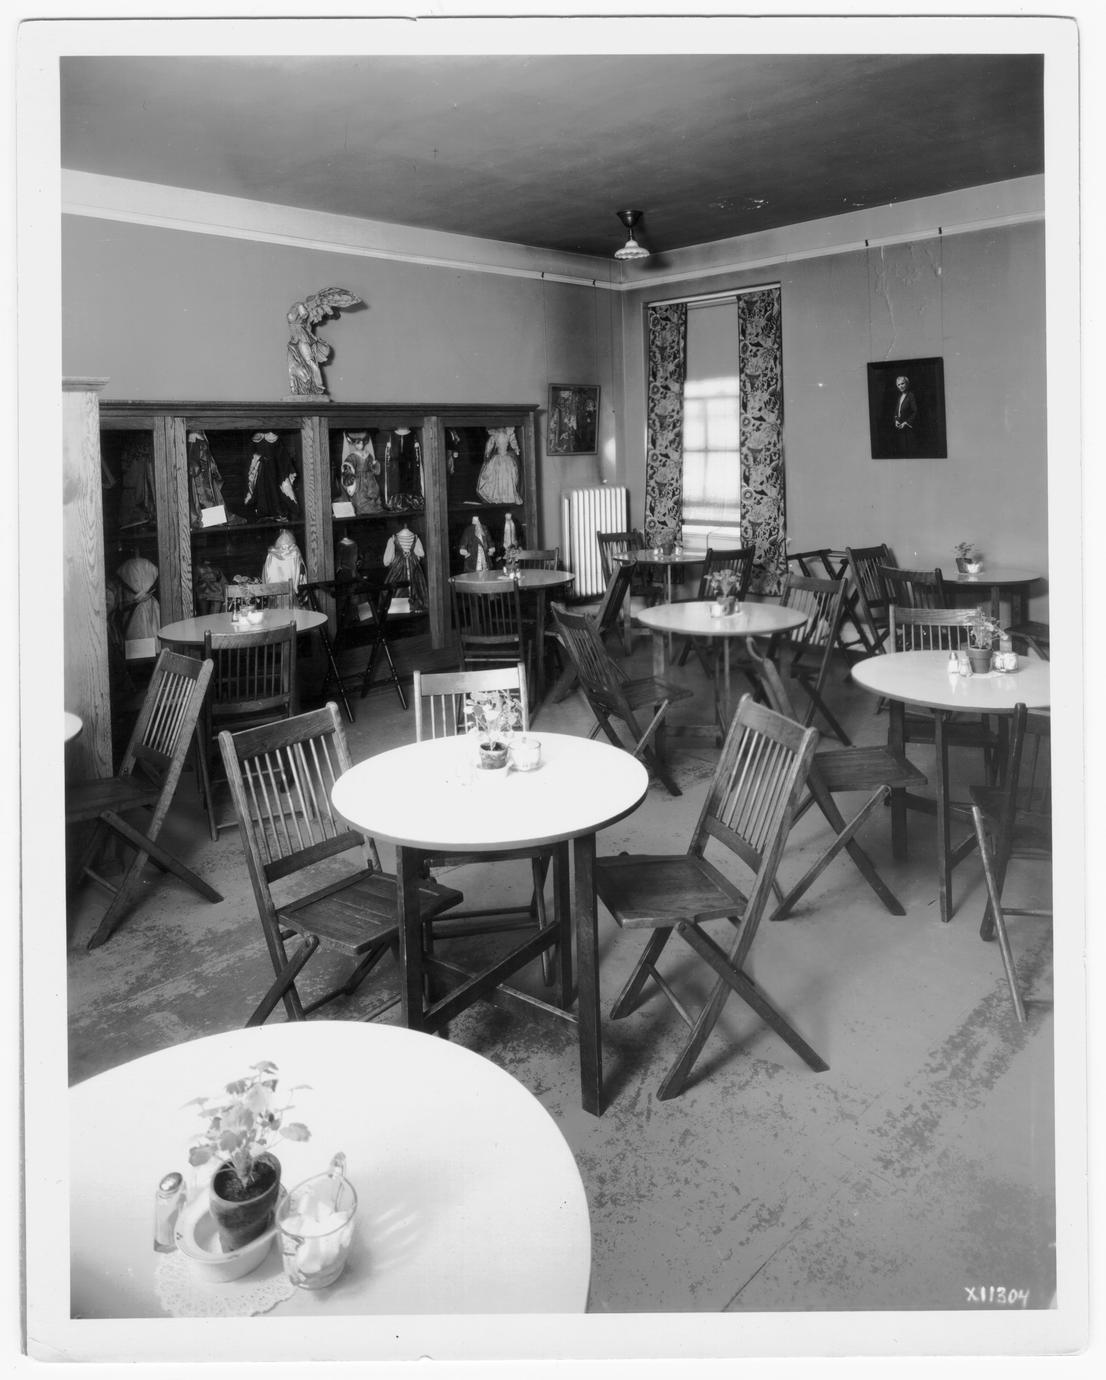 Home economics lunch room